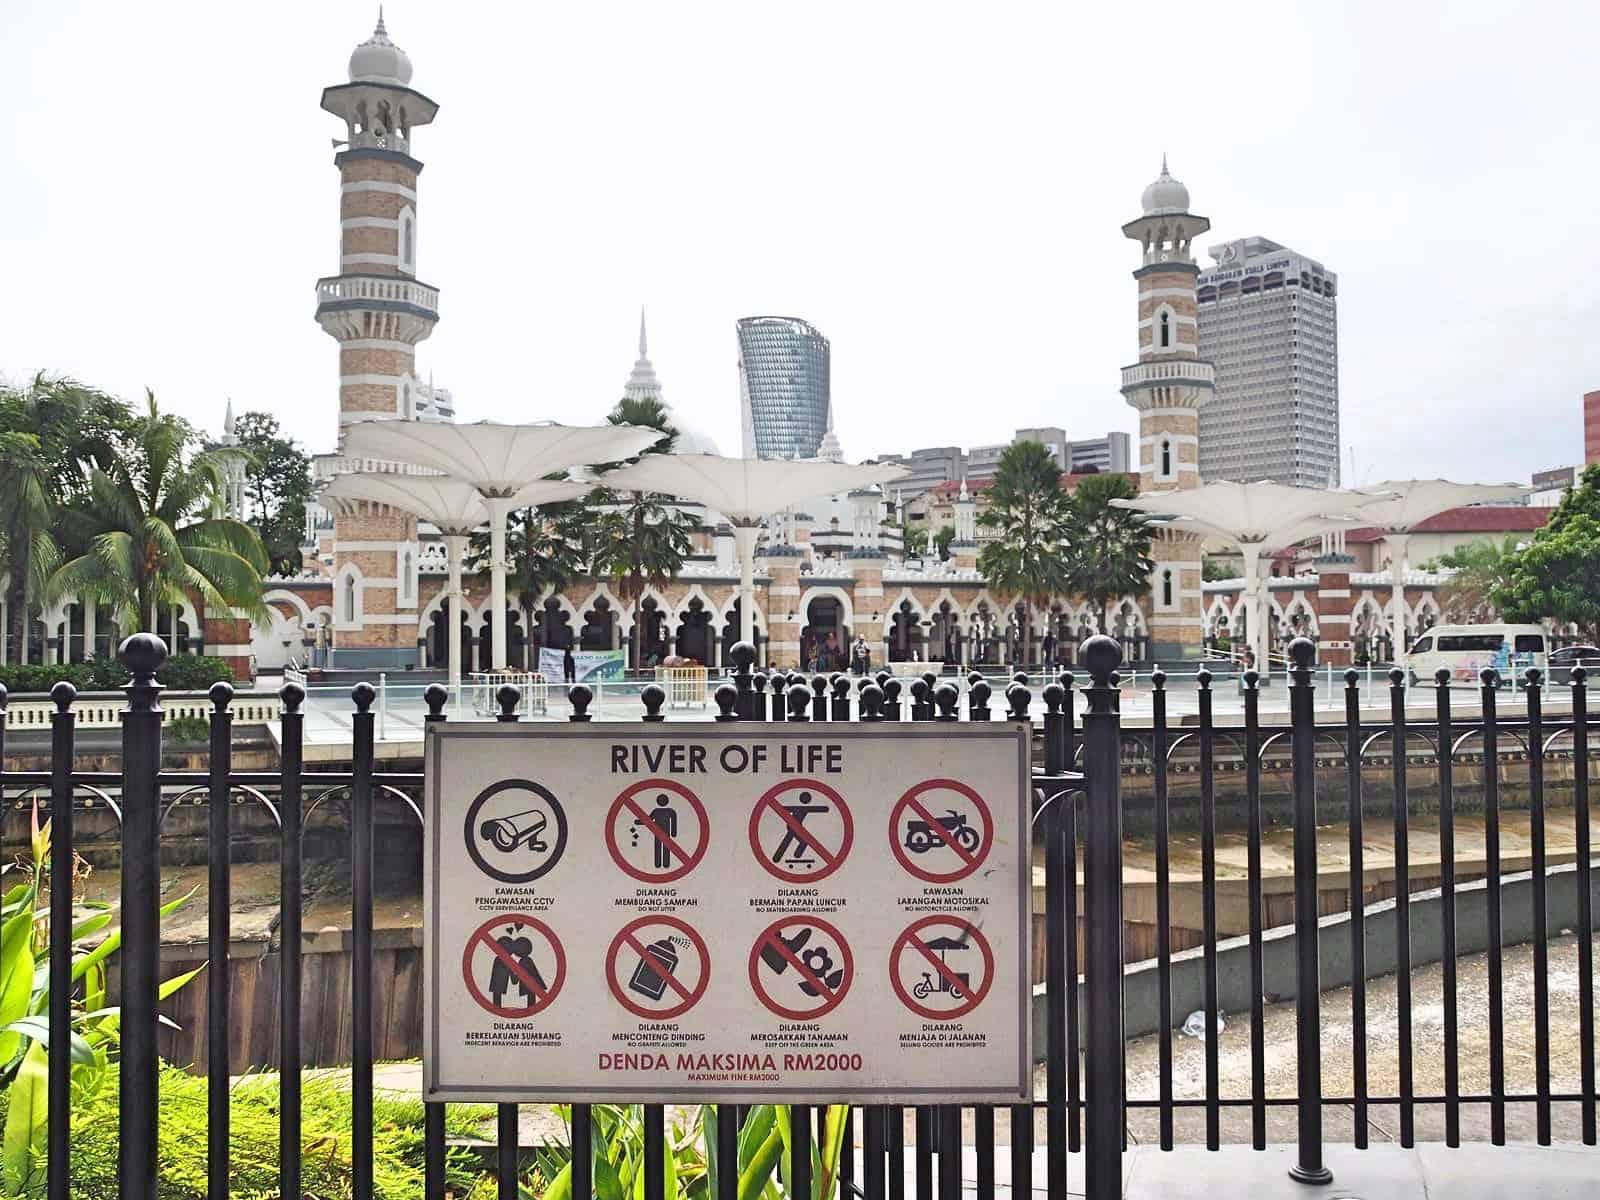 Masjid-Jamek-Mosque-KLCC-Rover-of-Life-Kuala-Lumpur-Malaysia